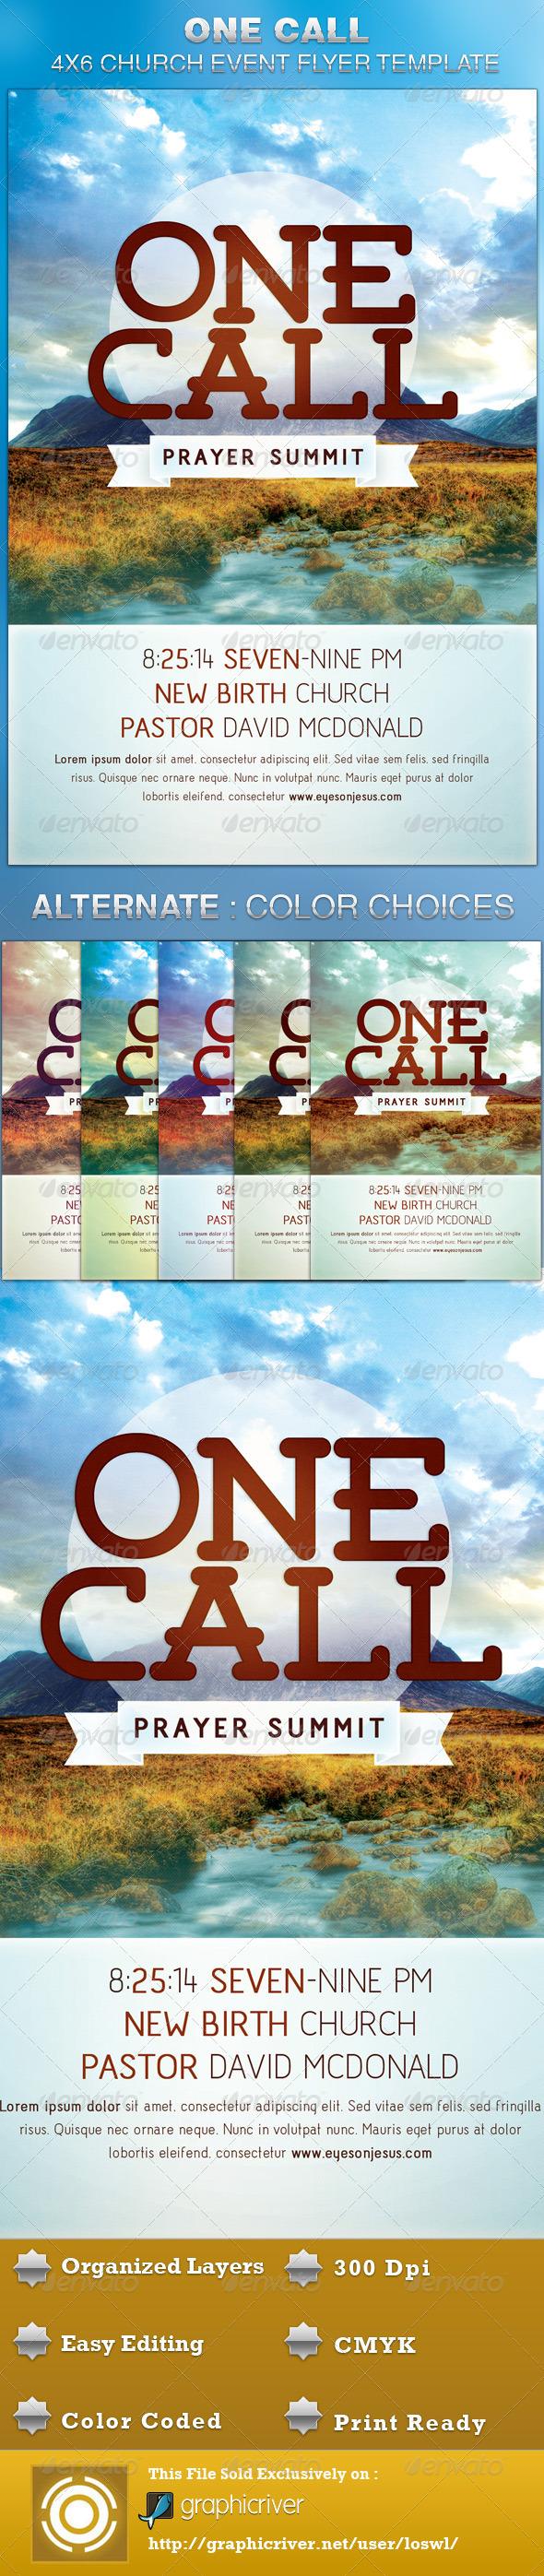 One Call Church Flyer Template - Church Flyers